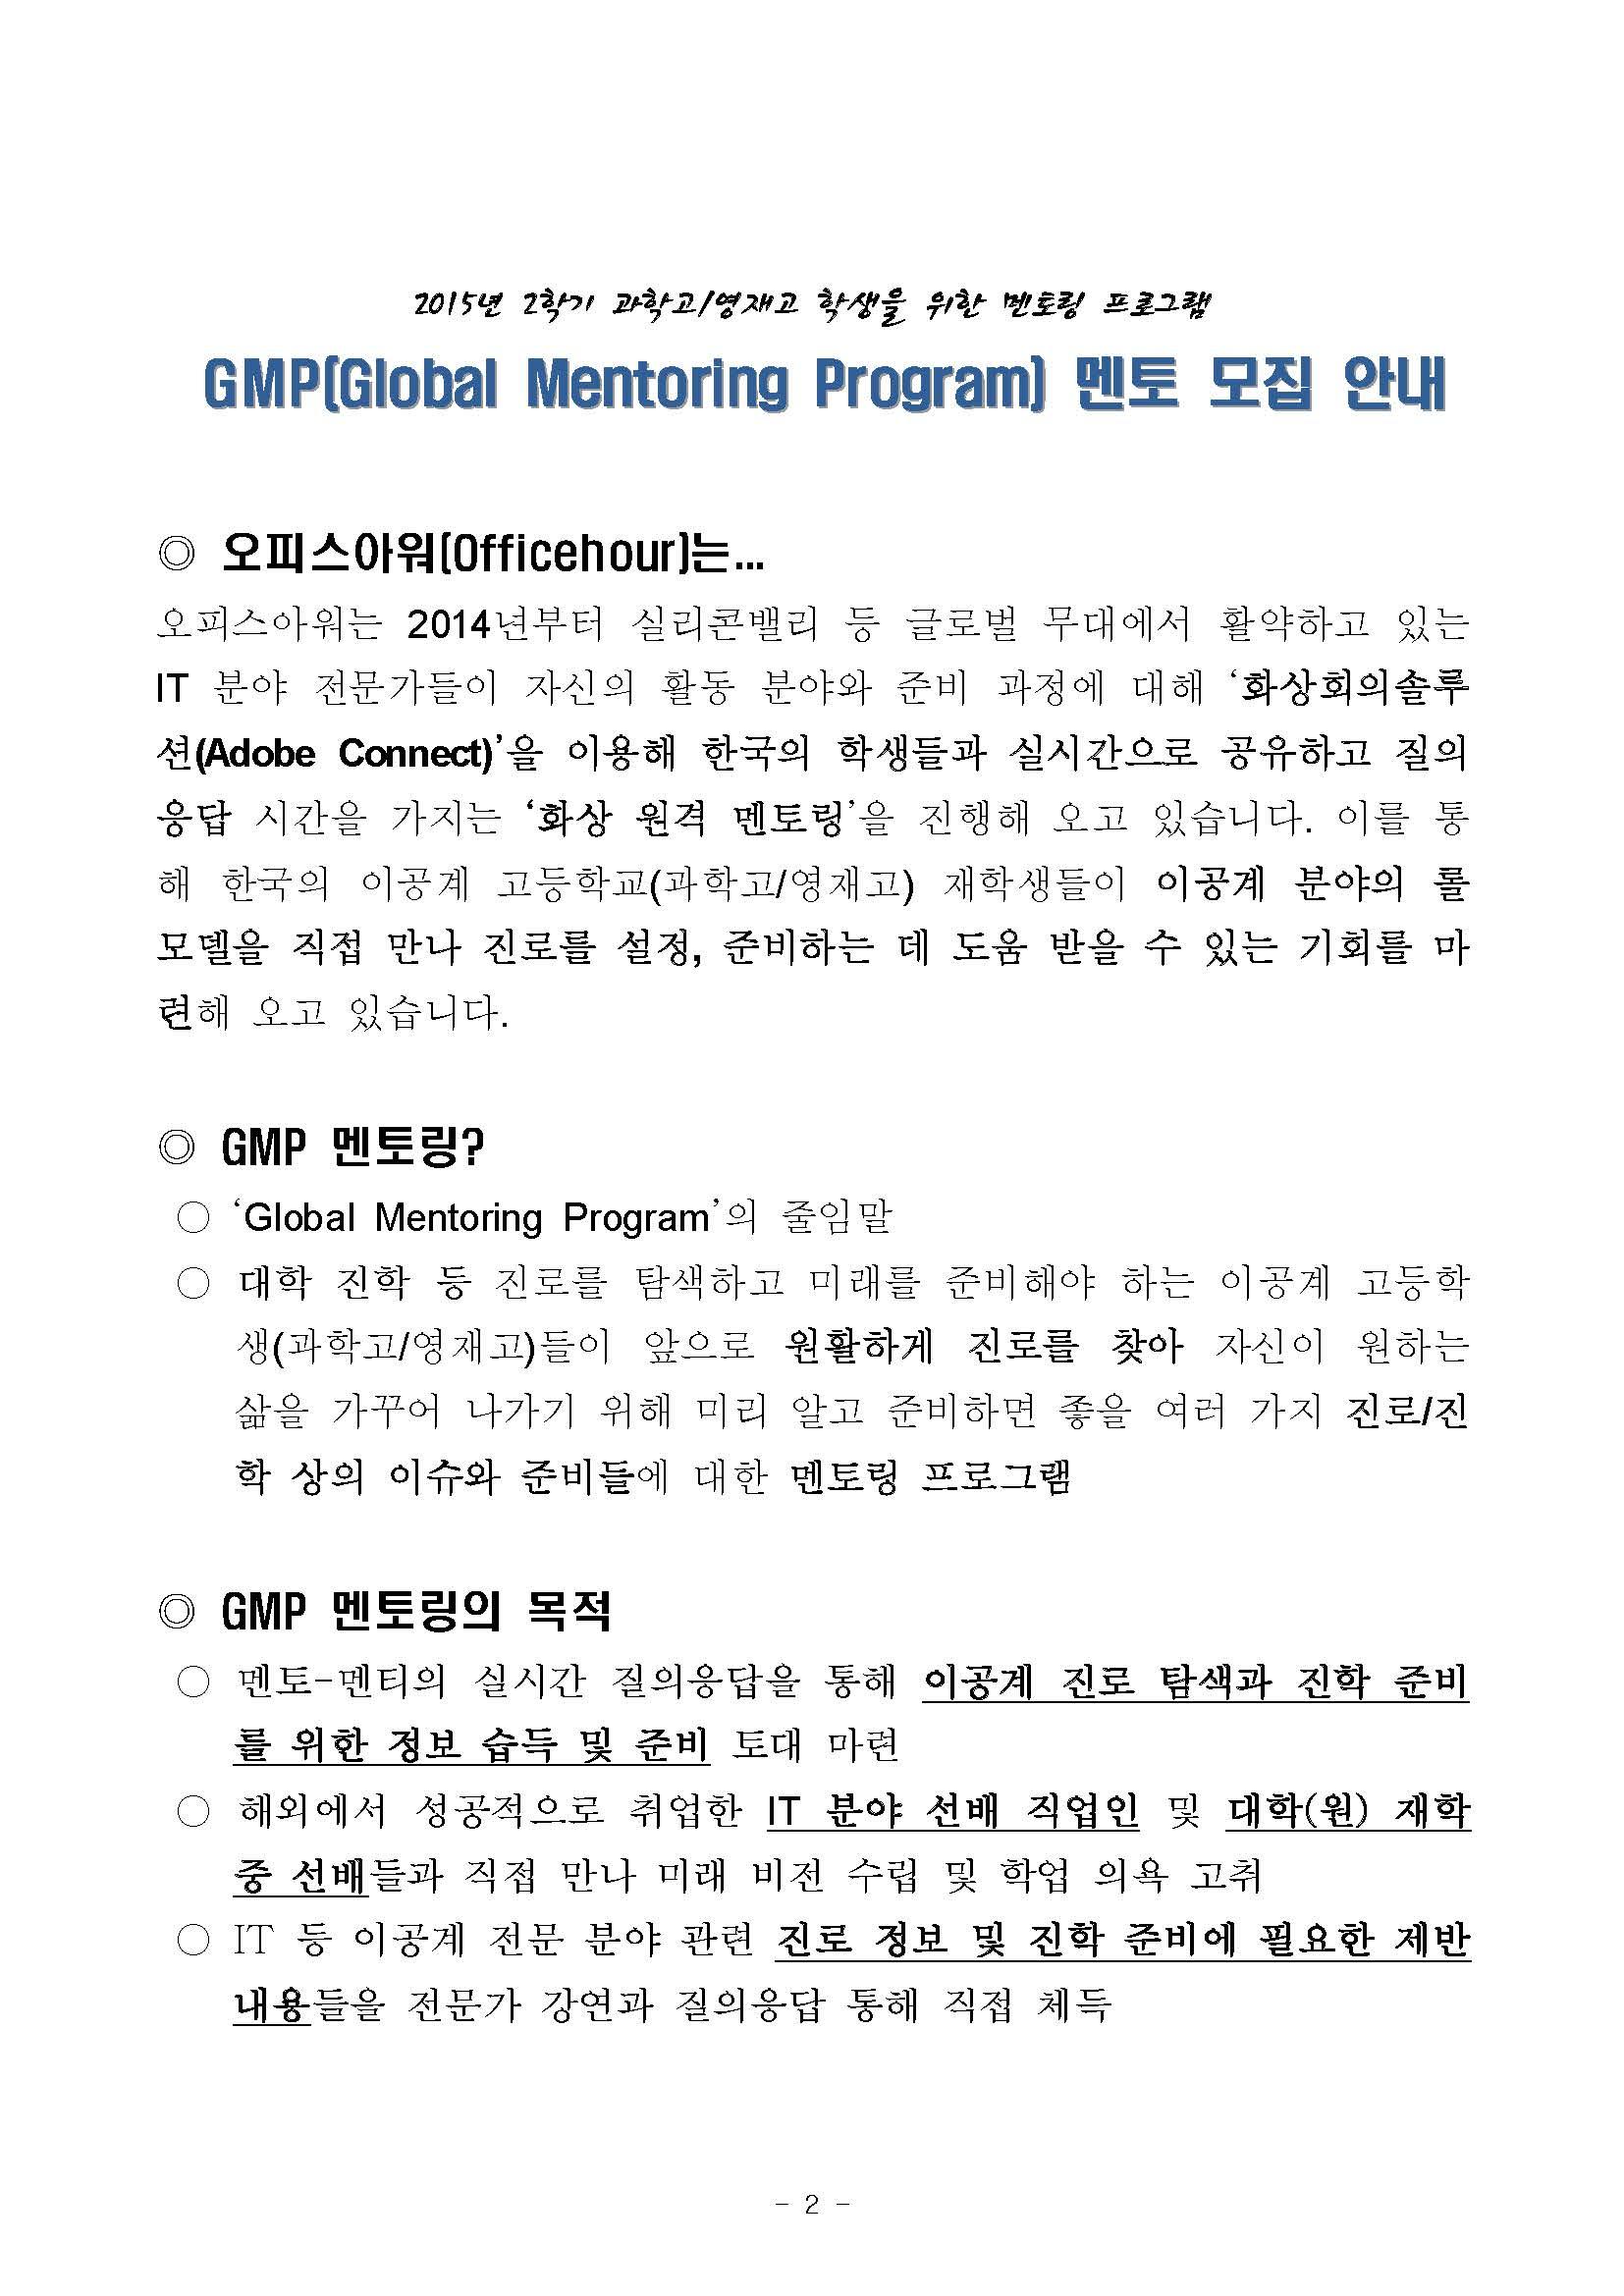 GMP 프로그램 멘토 모집 공고문_150814 (1)_페이지_2.jpg